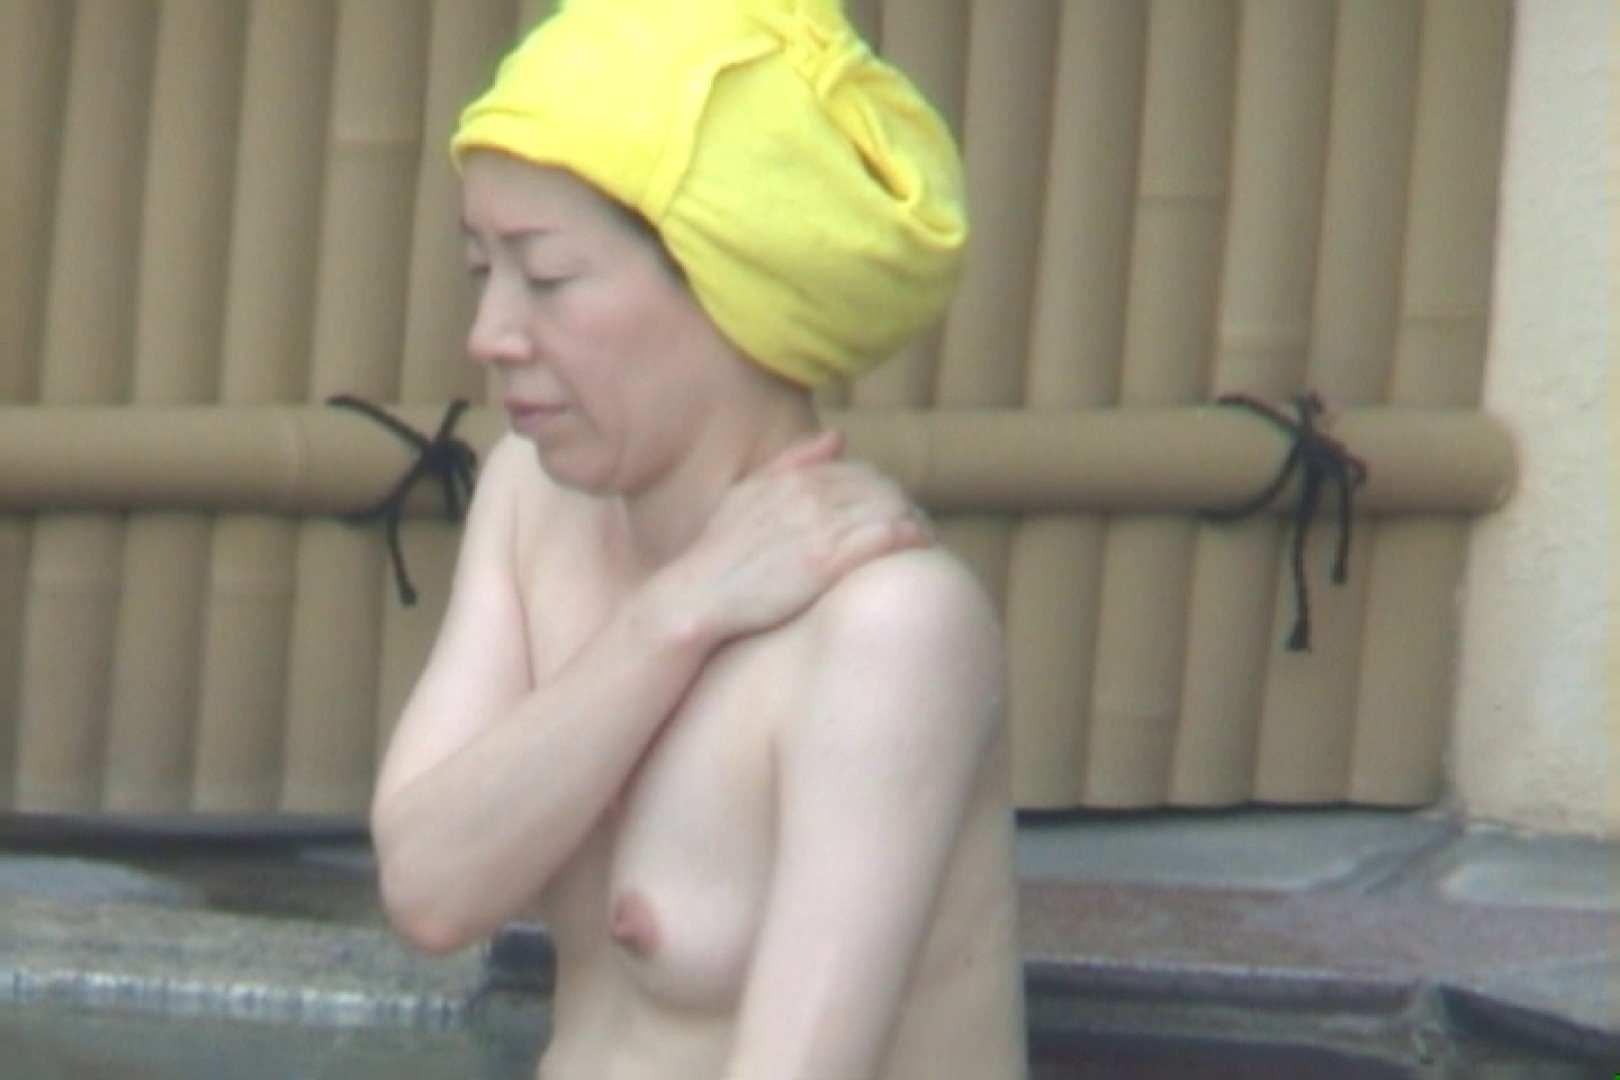 Aquaな露天風呂Vol.569 盗撮シリーズ | 露天風呂編  84PIX 65